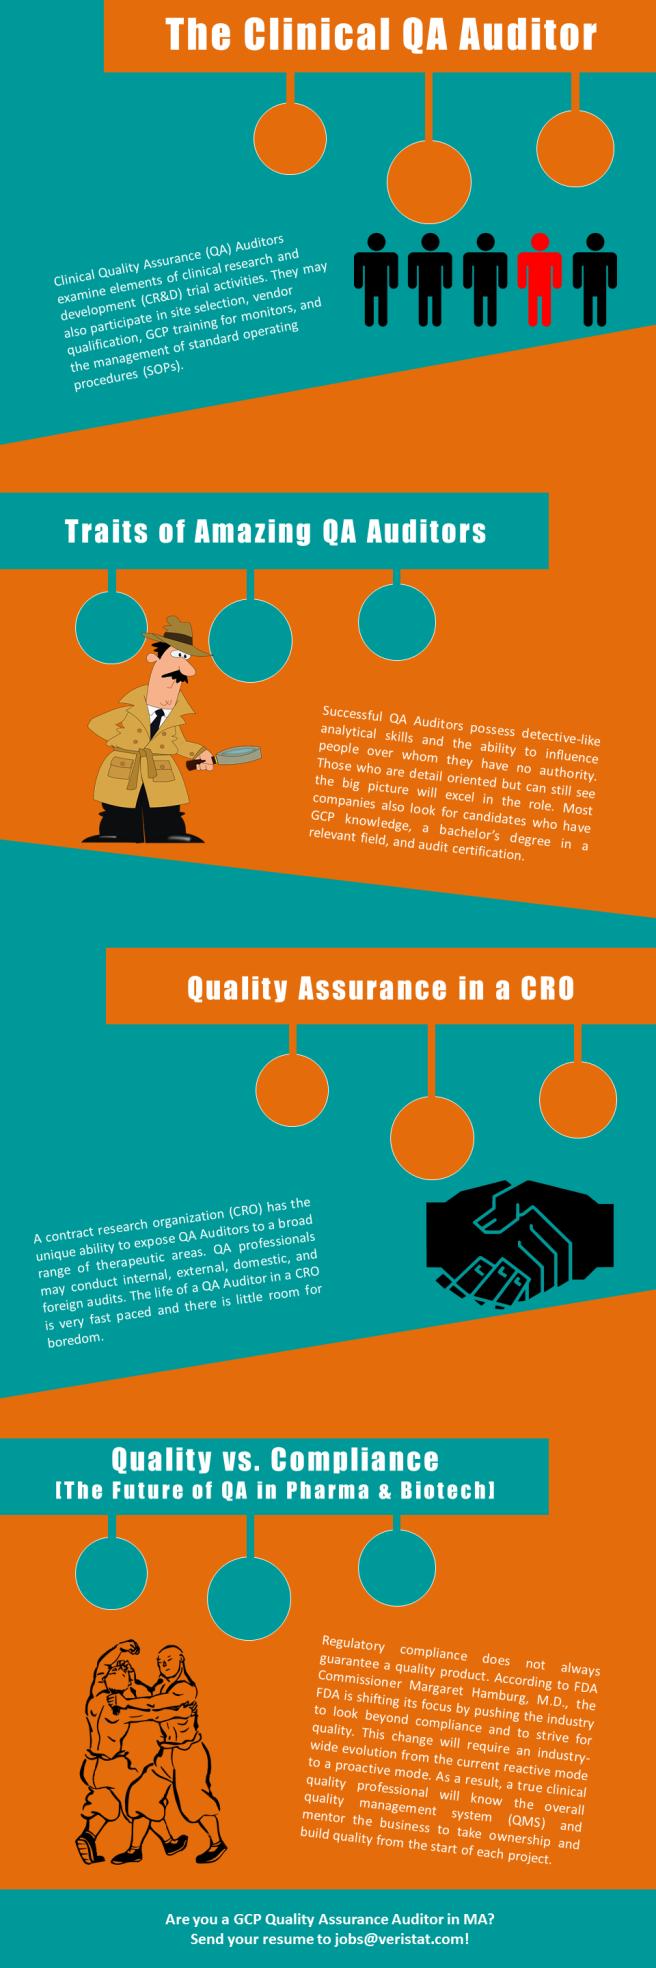 Veristat-Quality-Assurance-Audiitor